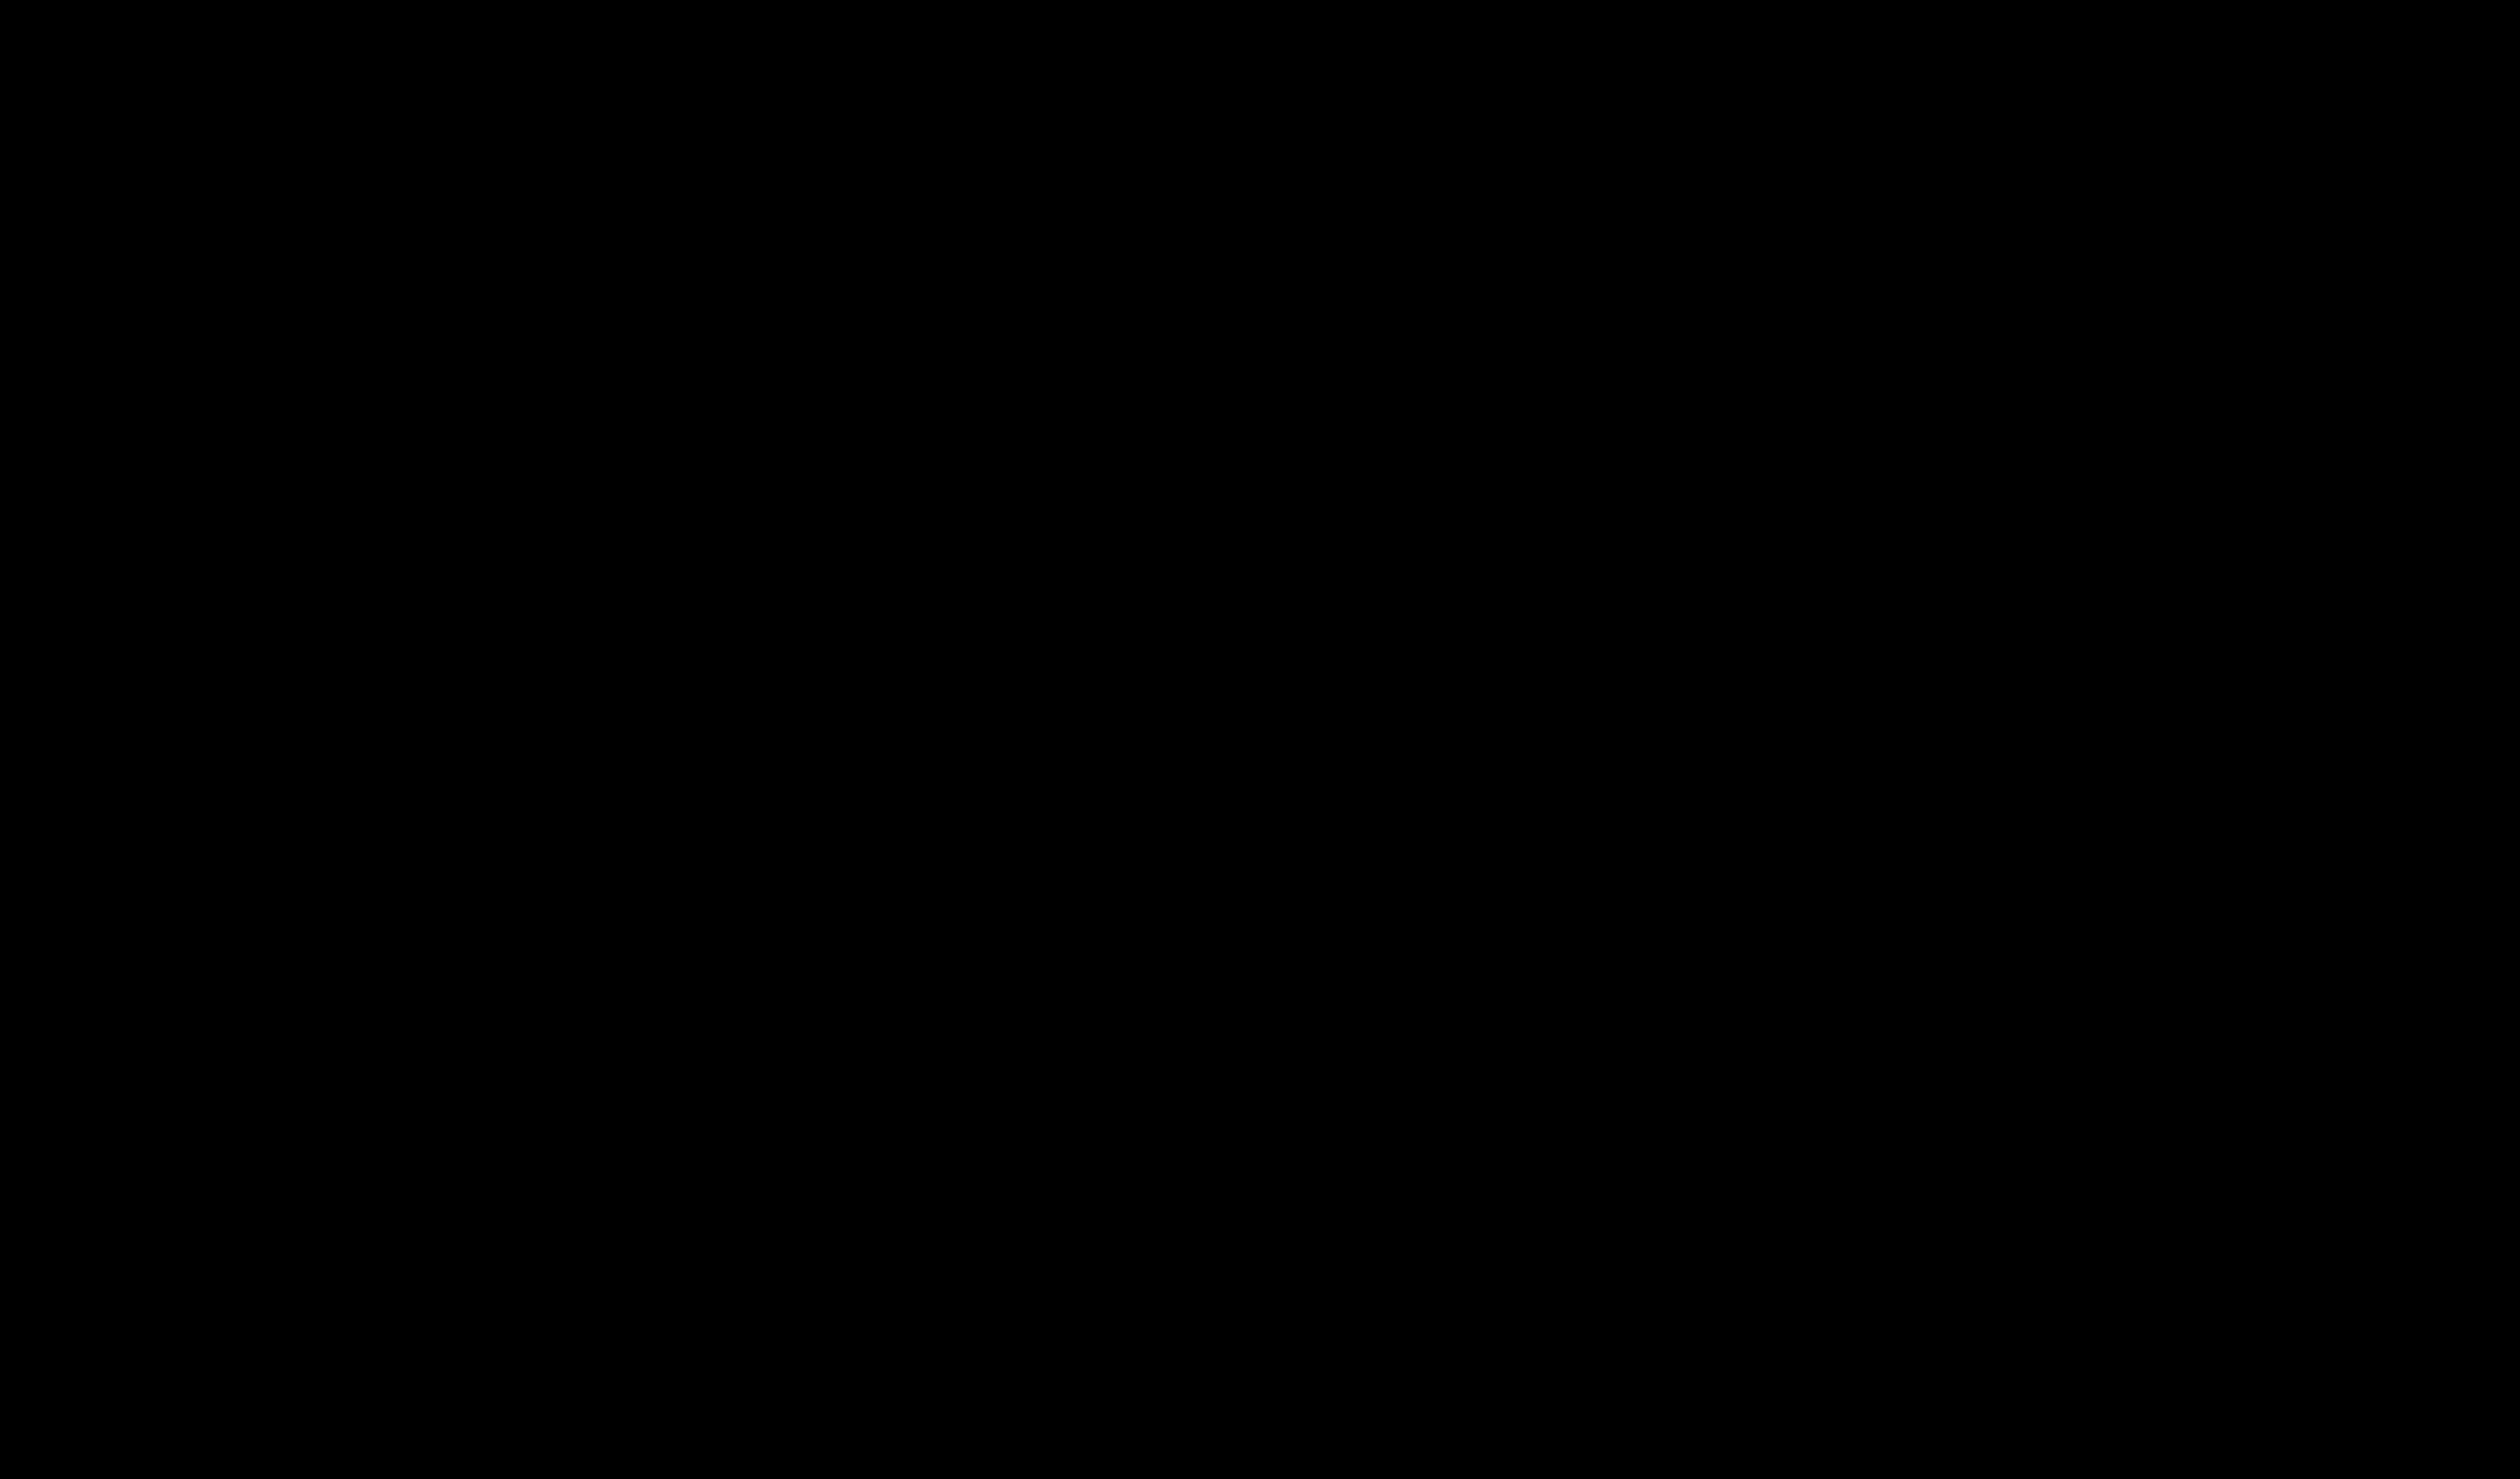 IP Datagram divisibility